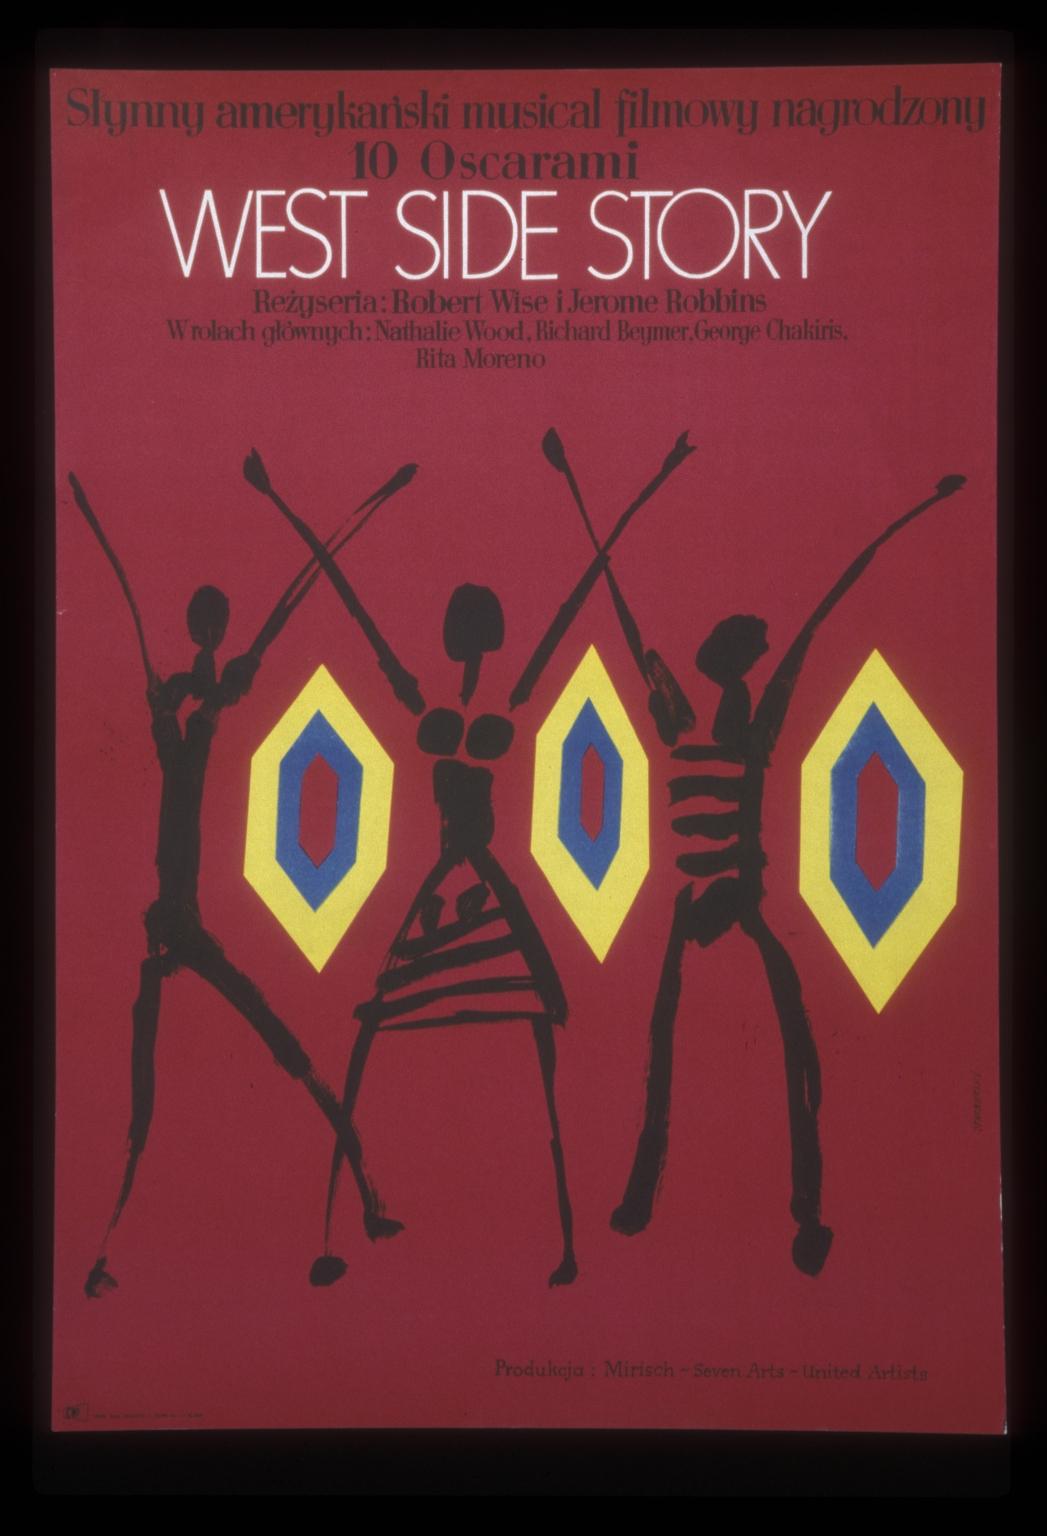 West side story: slynny amerykanski musical filmowy nagrodzony 10 Oskarami